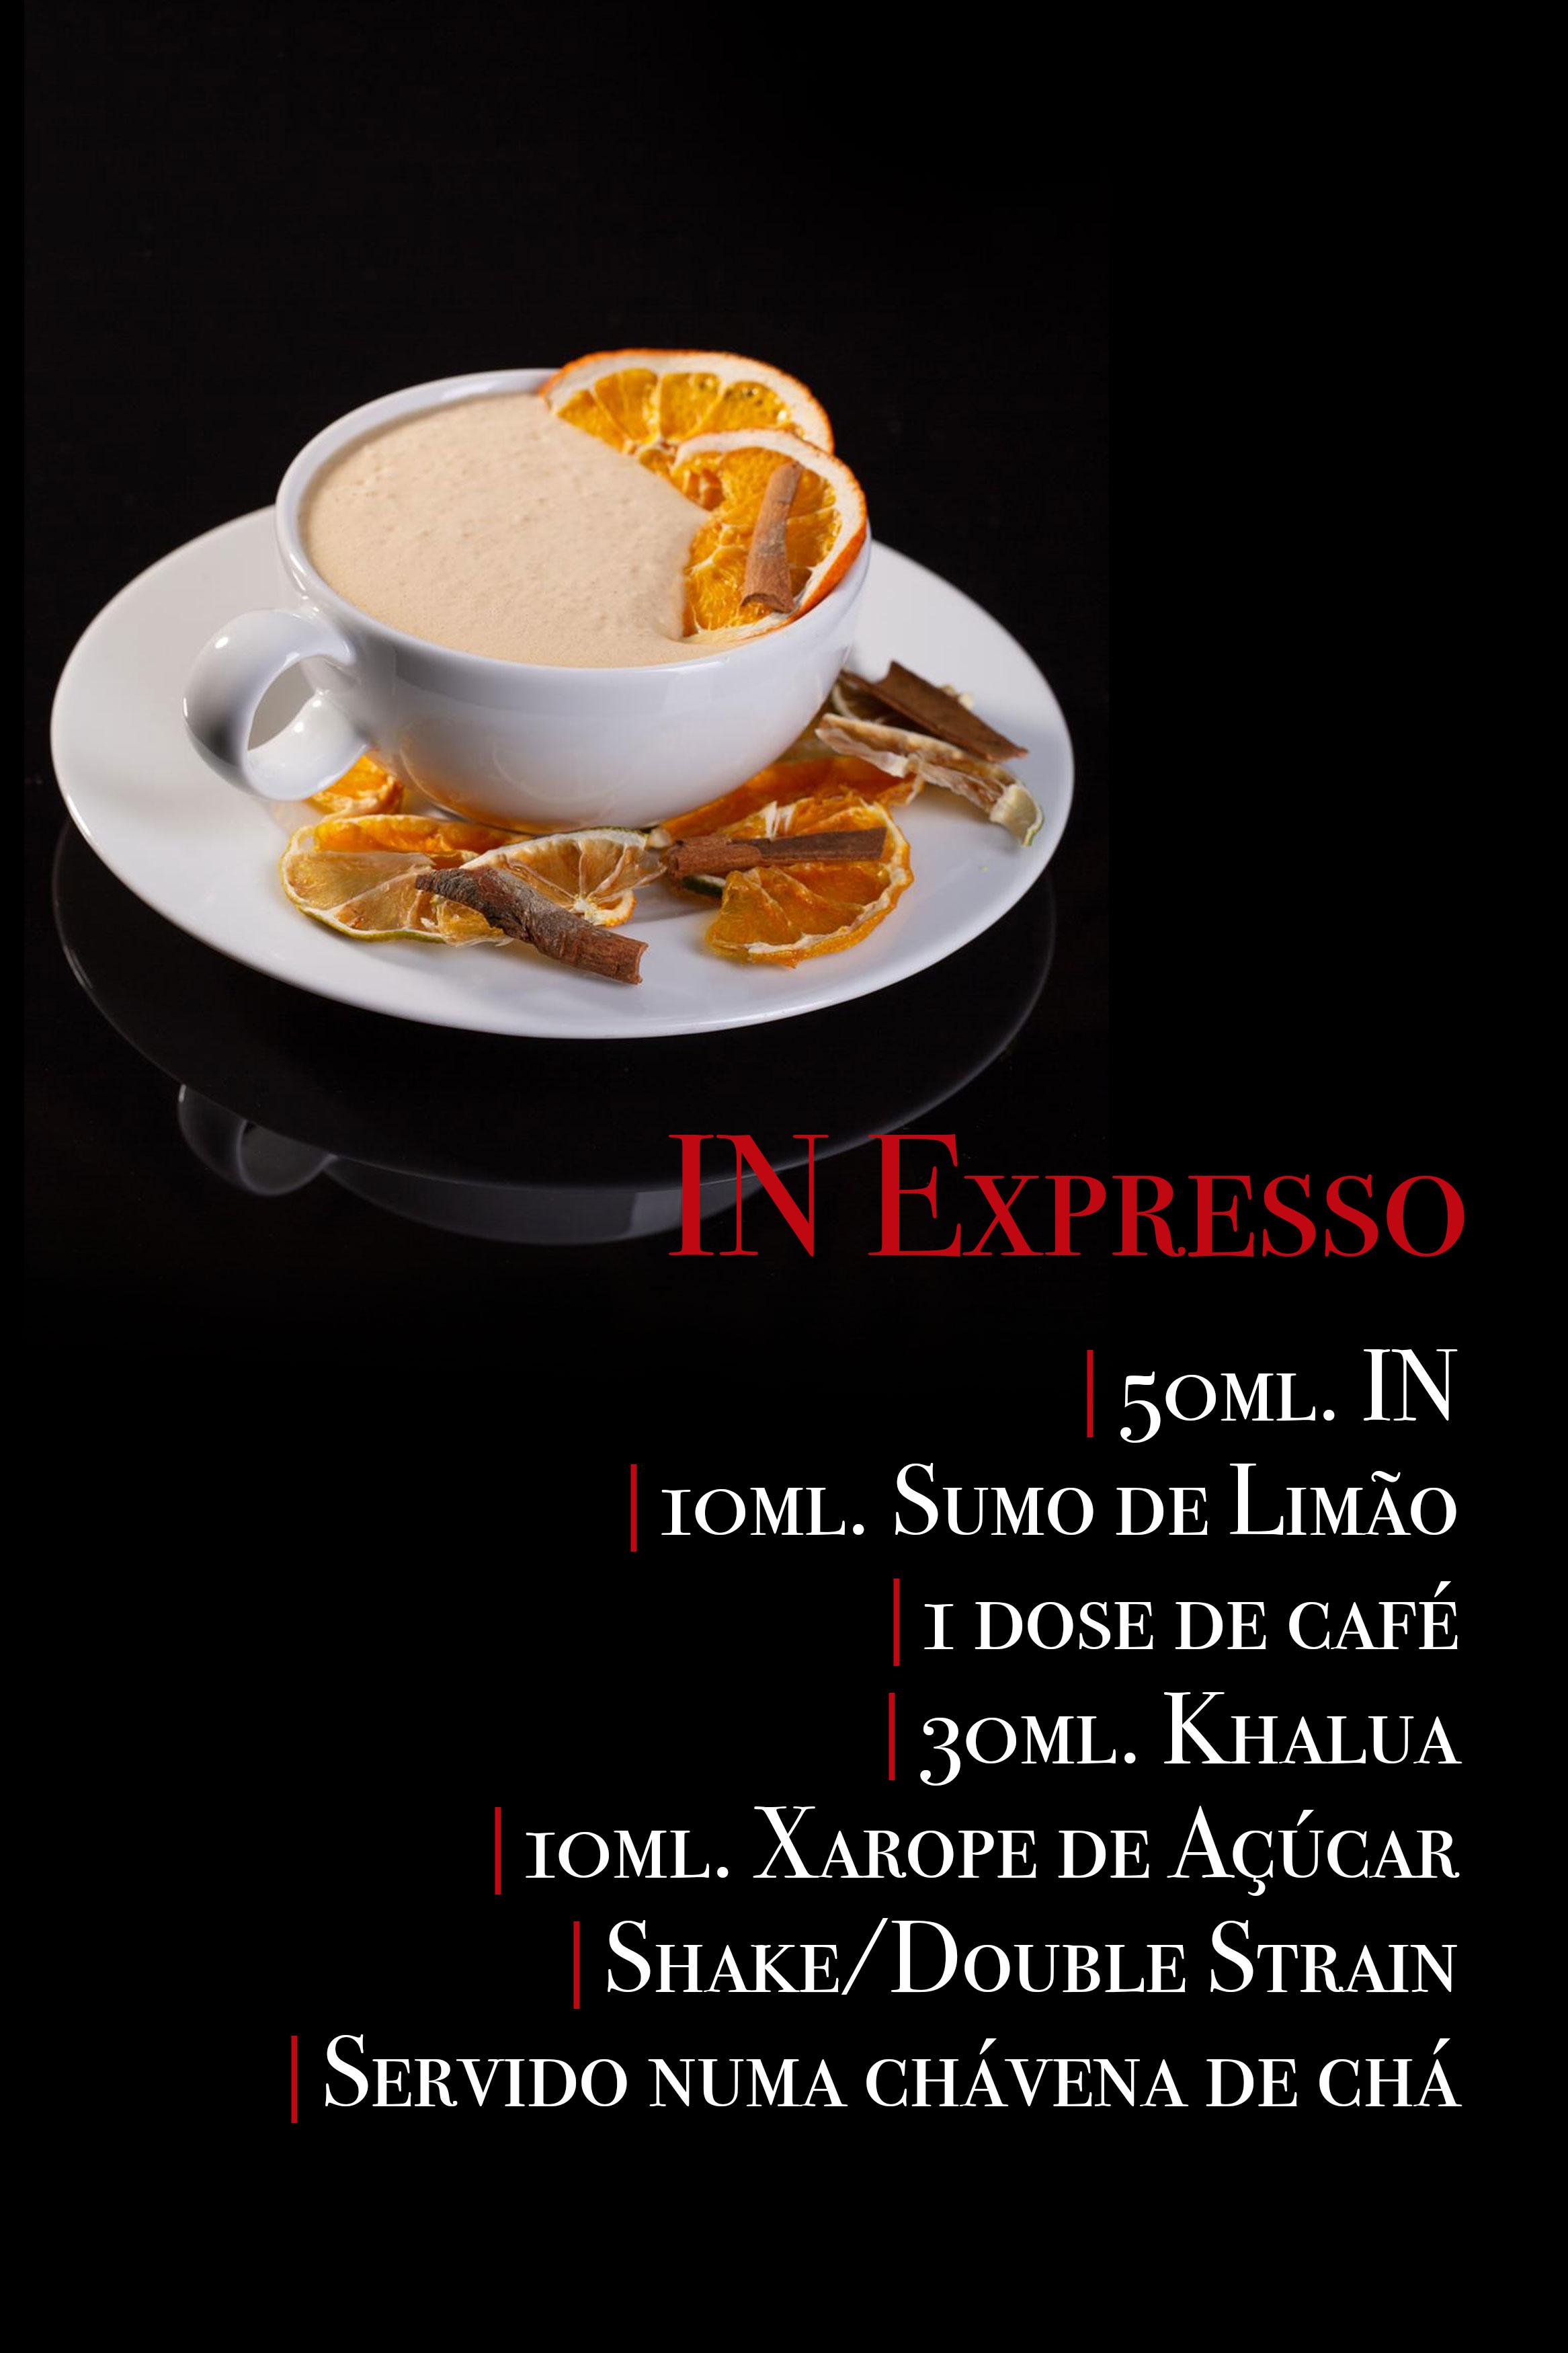 IN-EXPRESSO_texto